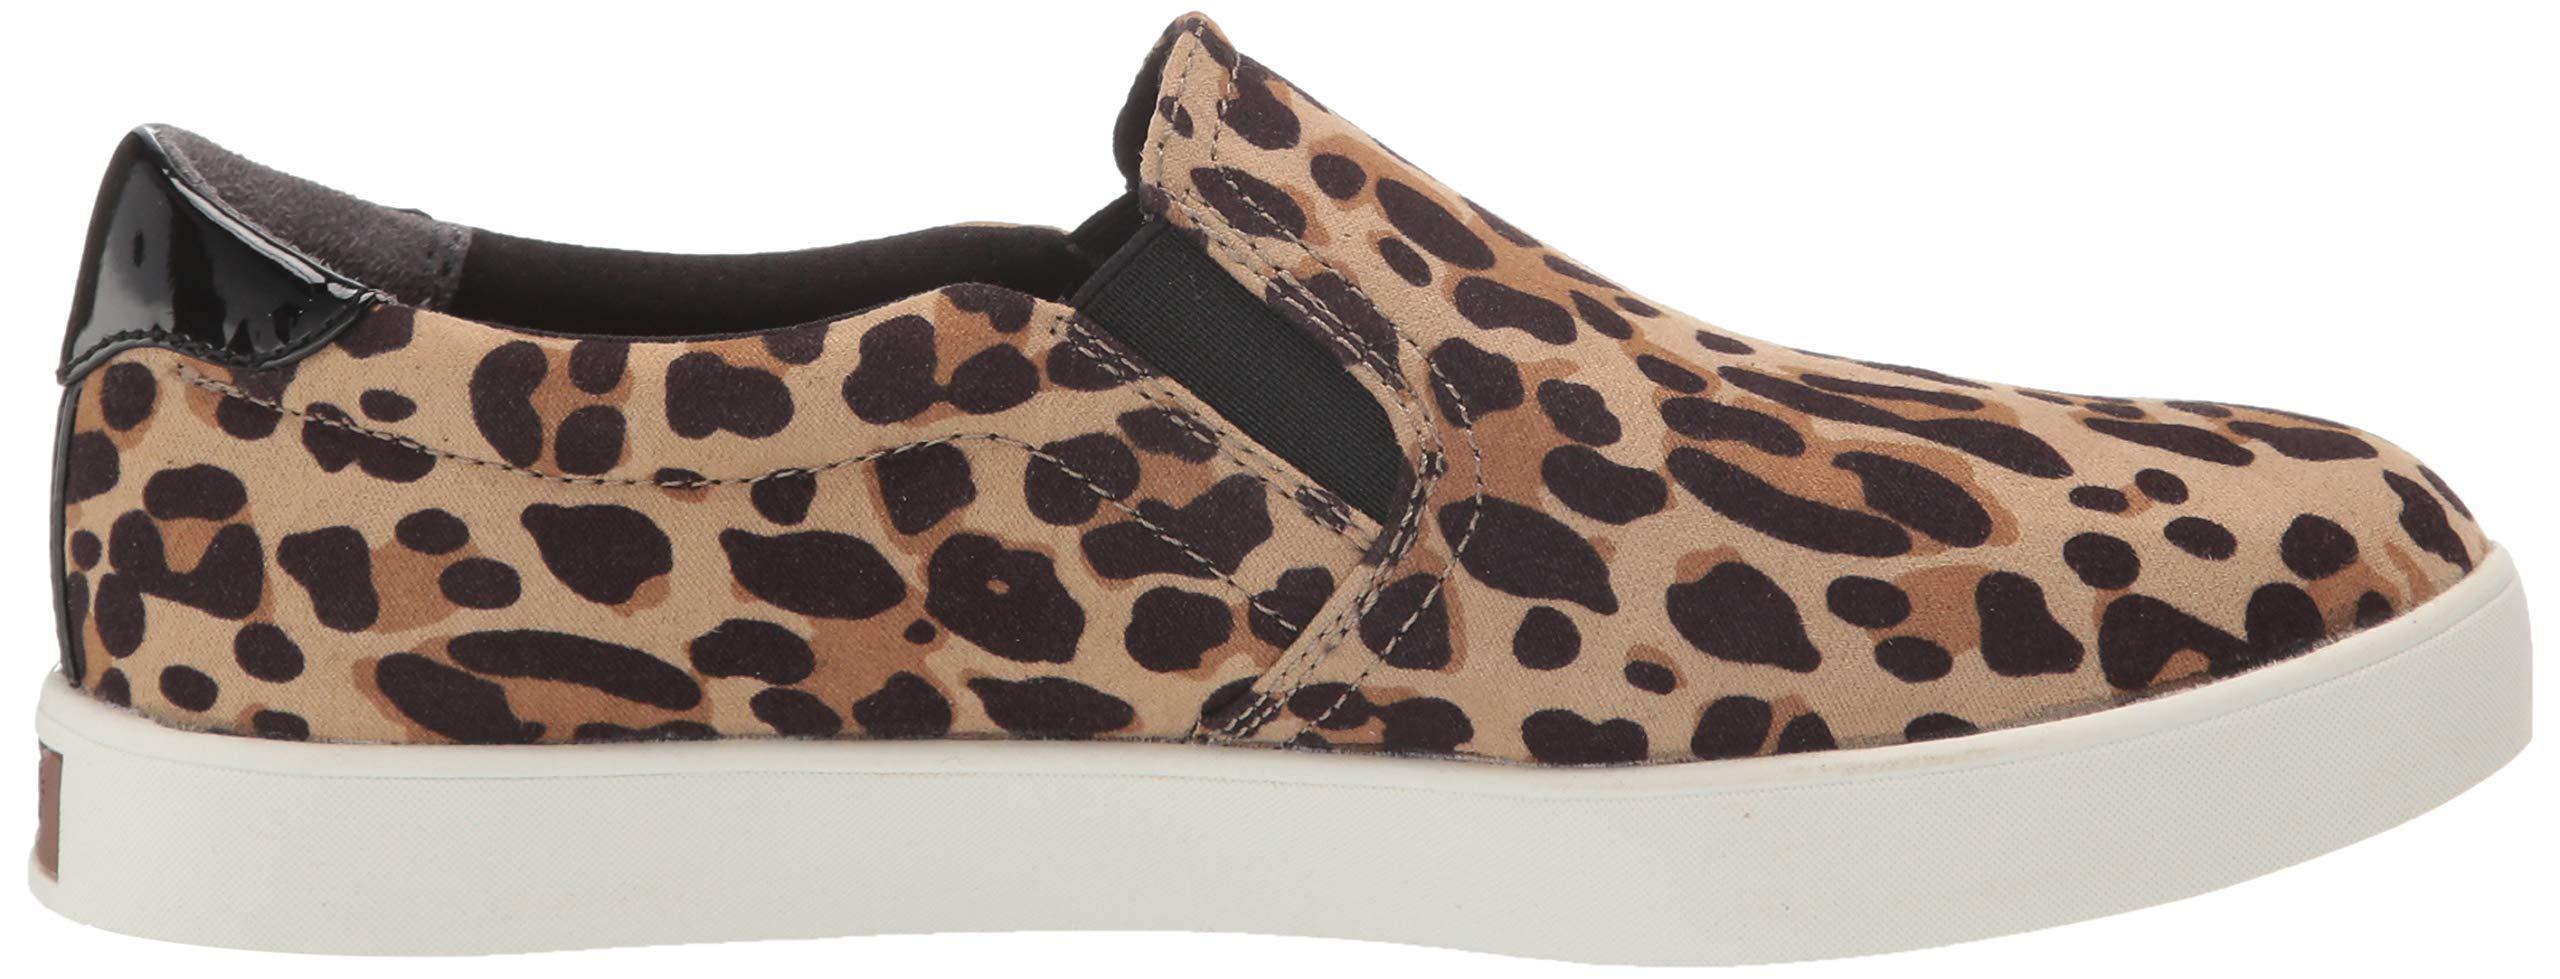 Dr-Scholls-Shoes-Womens-Madison-Fashion-Sneaker